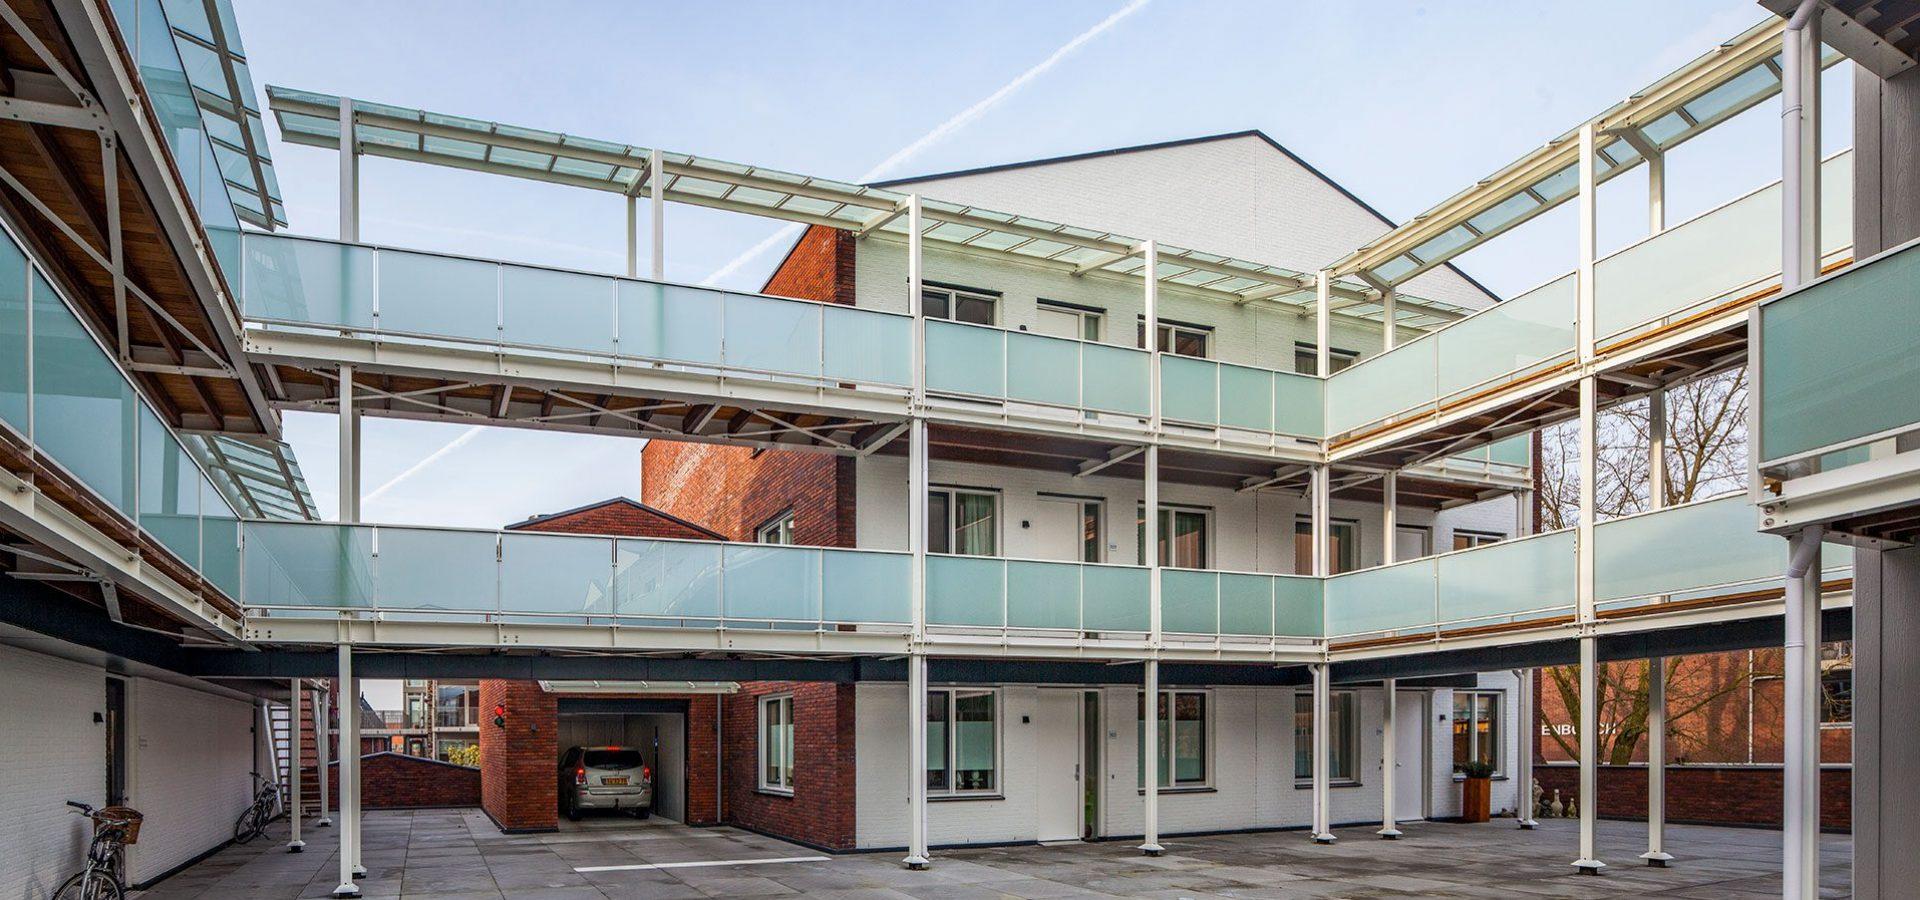 FARO architecten Supermarkt en woningen Twello 02